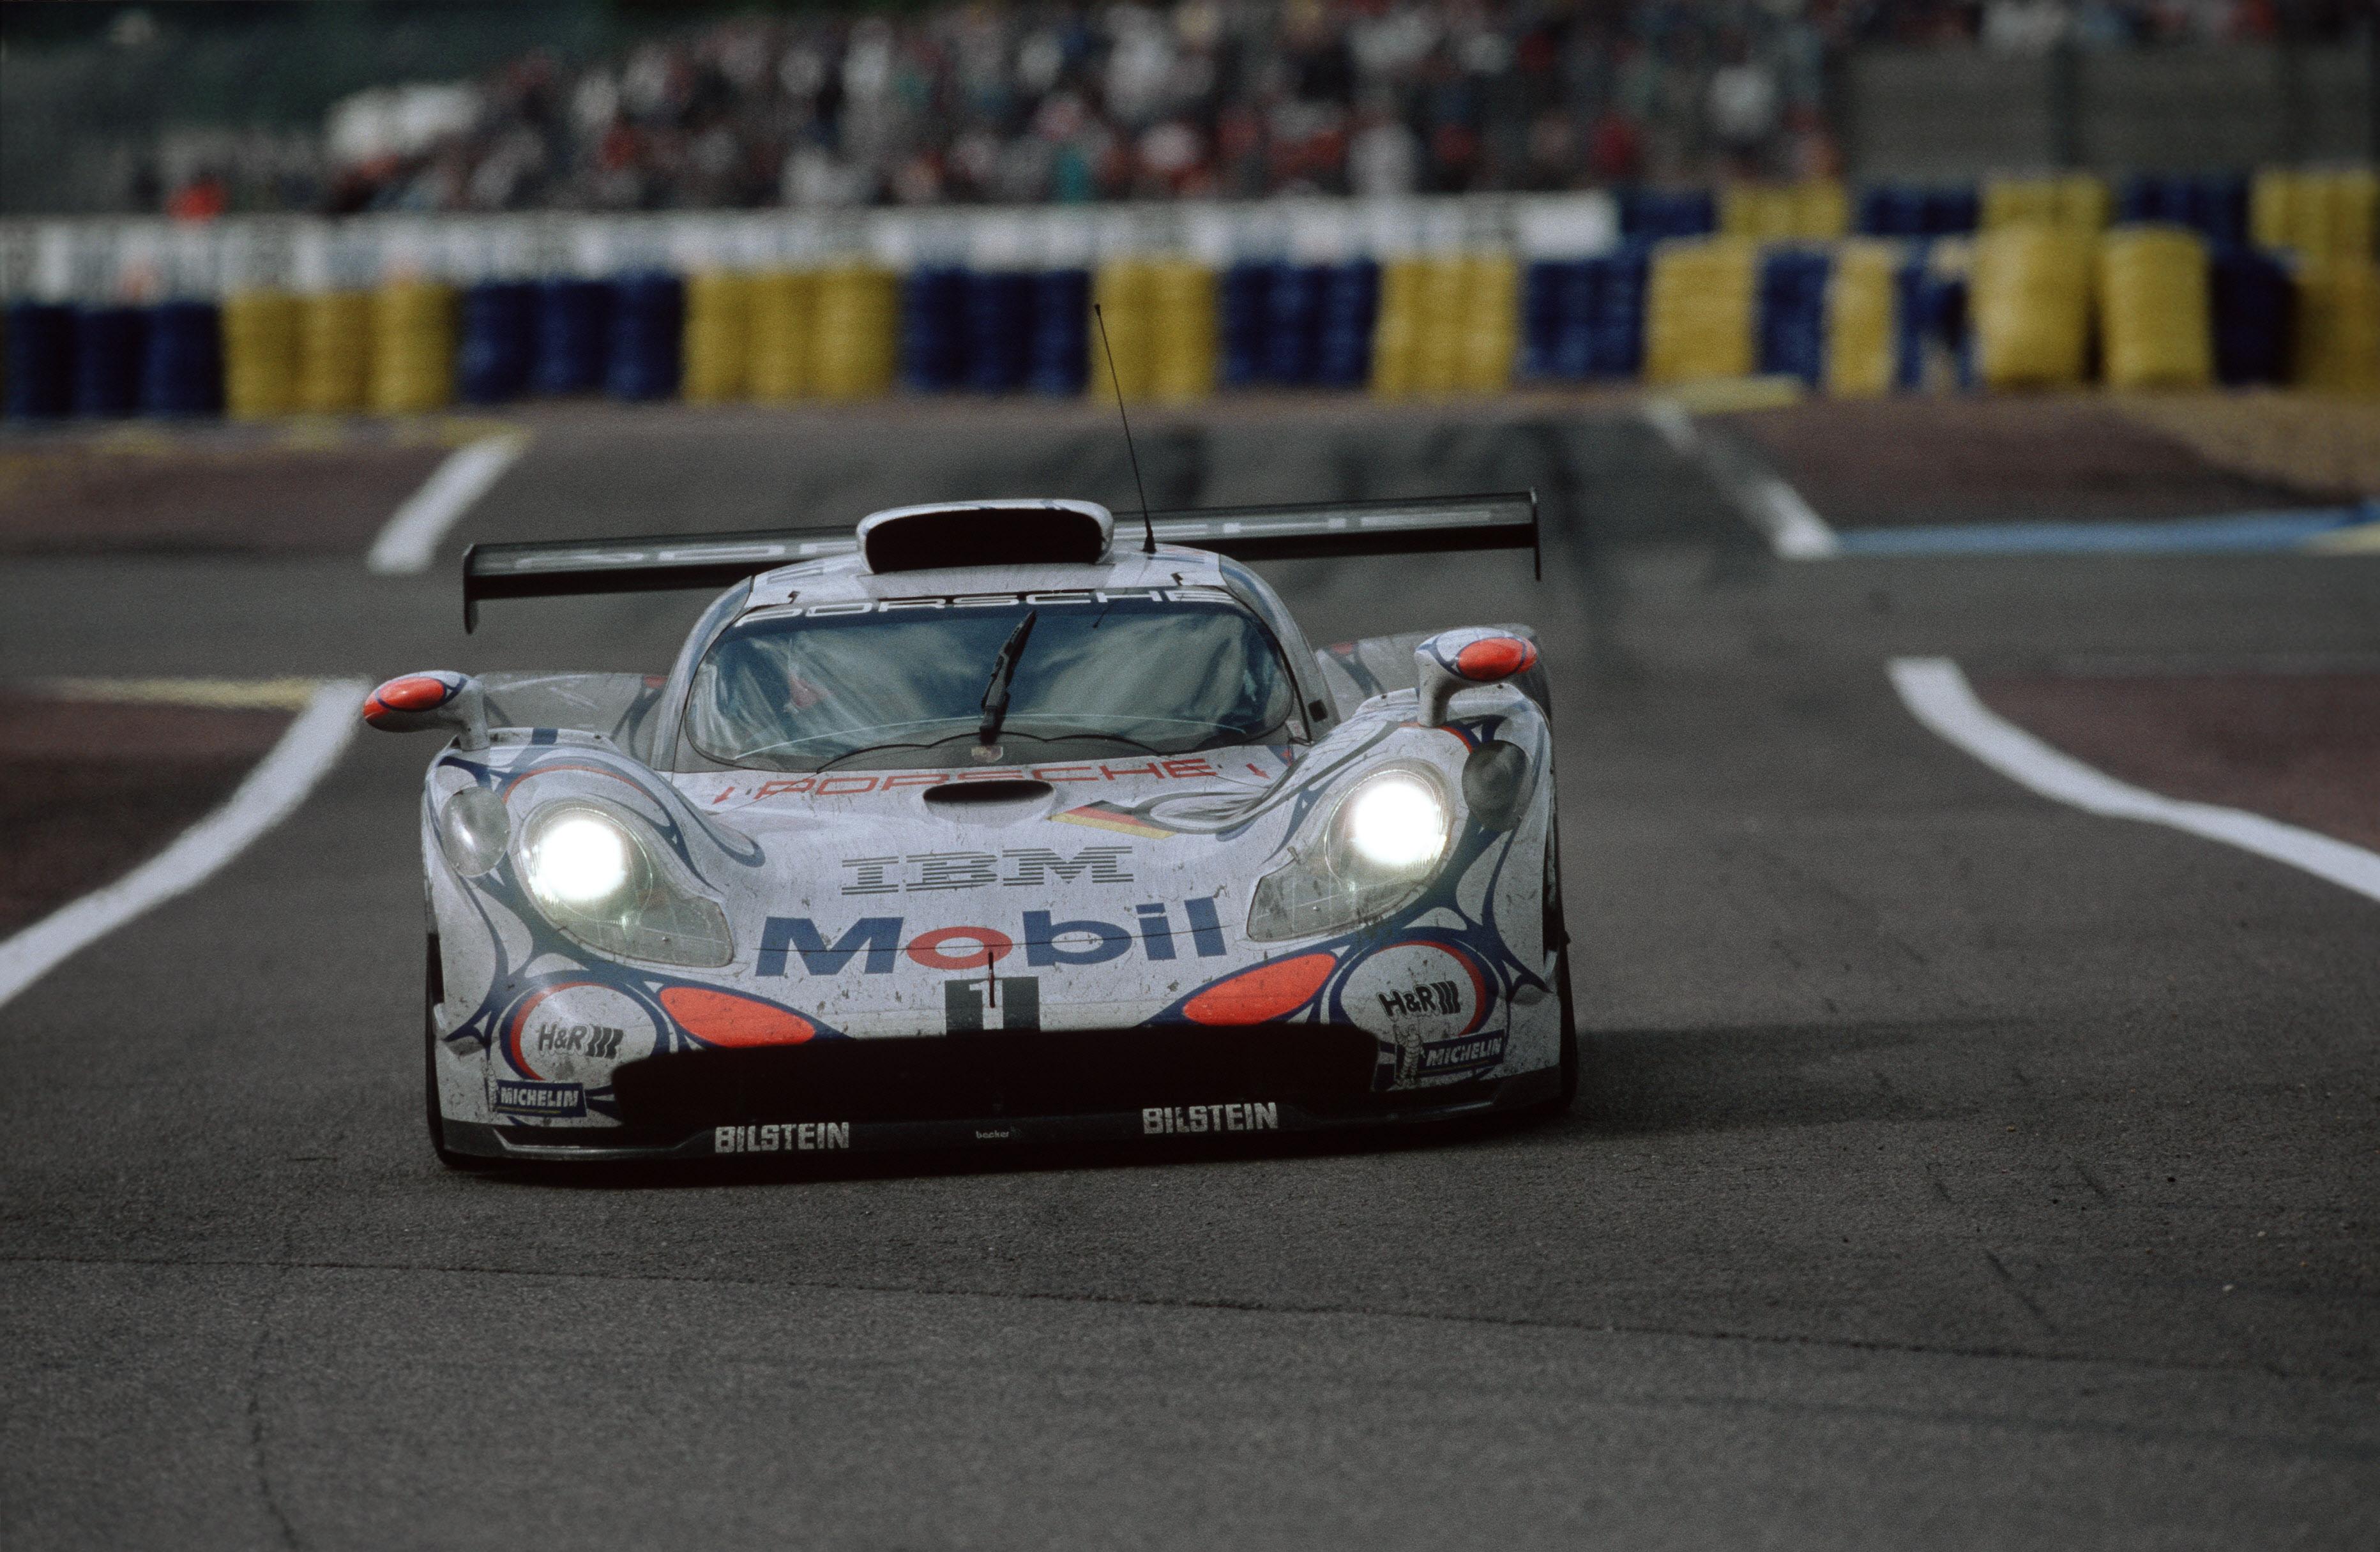 m11_2530_fine Inspiring Porsche 911 Gt1 Road atlanta Cars Trend